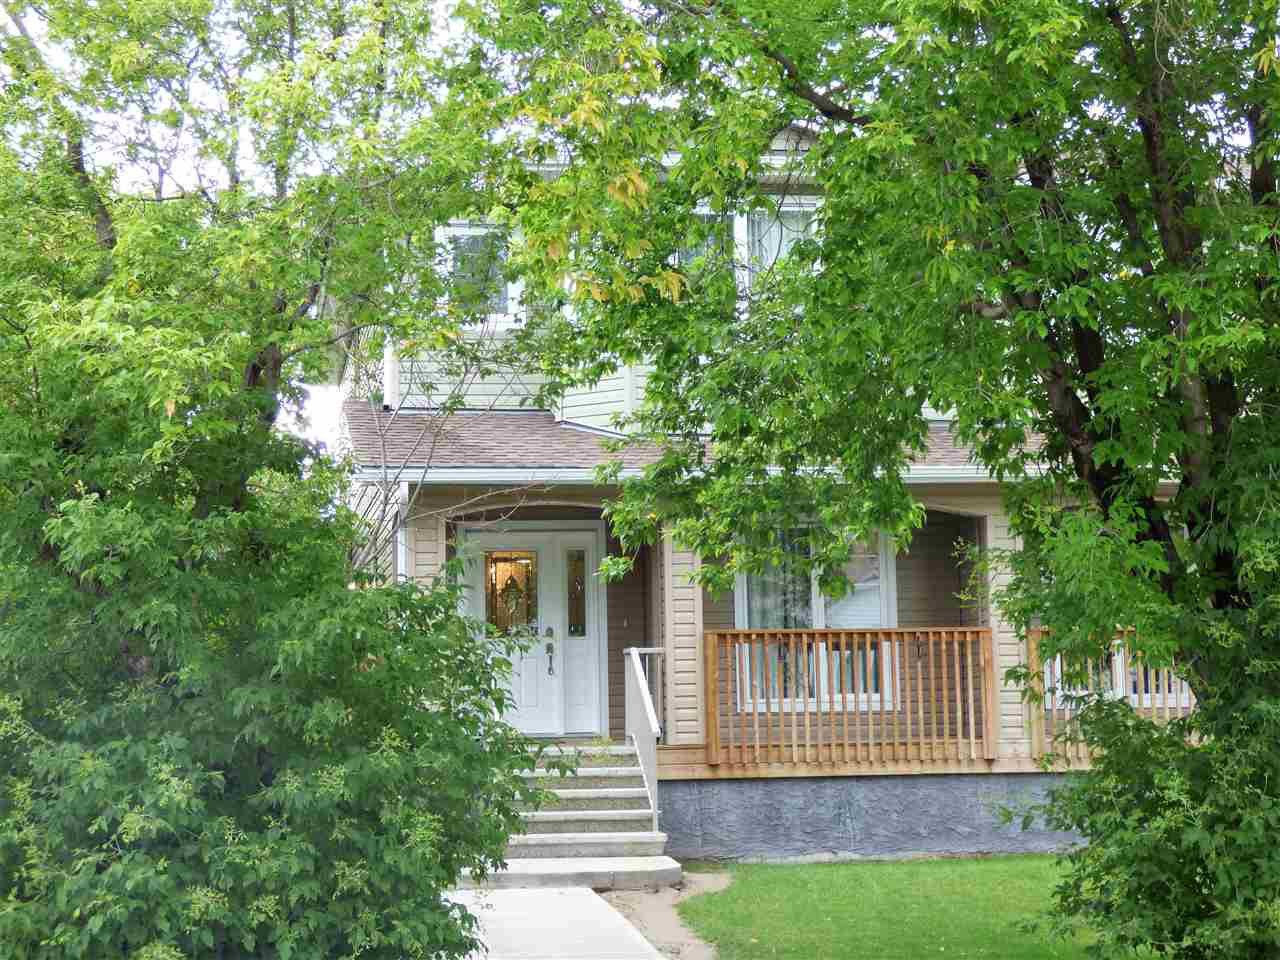 Main Photo: 10708 151 Street in Edmonton: Zone 21 House Half Duplex for sale : MLS®# E4166574